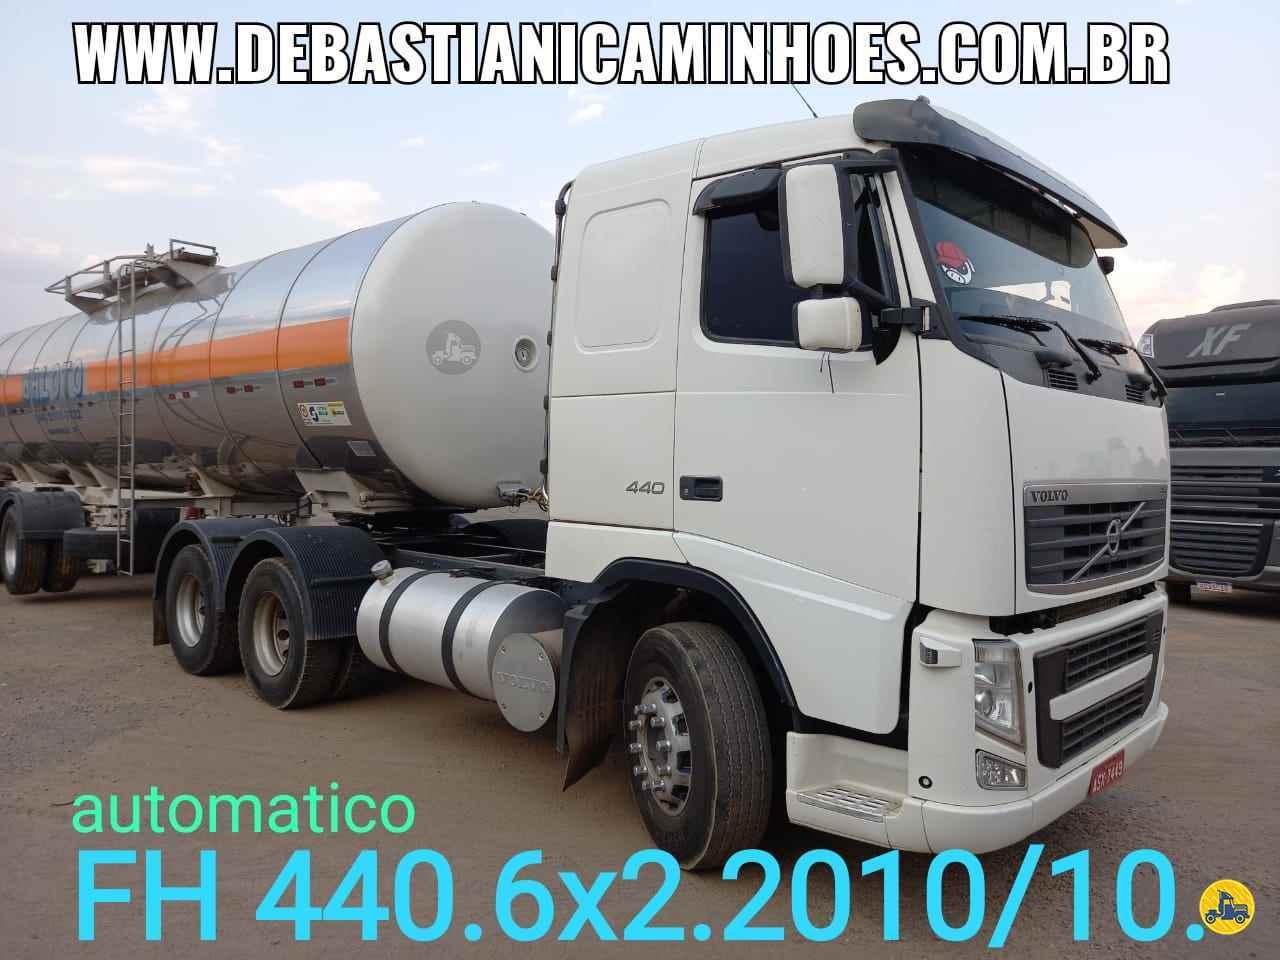 CAMINHAO VOLVO VOLVO FH 440 Cavalo Mecânico Truck 6x2 Debastiani Caminhões ANAPOLIS GOIAS GO